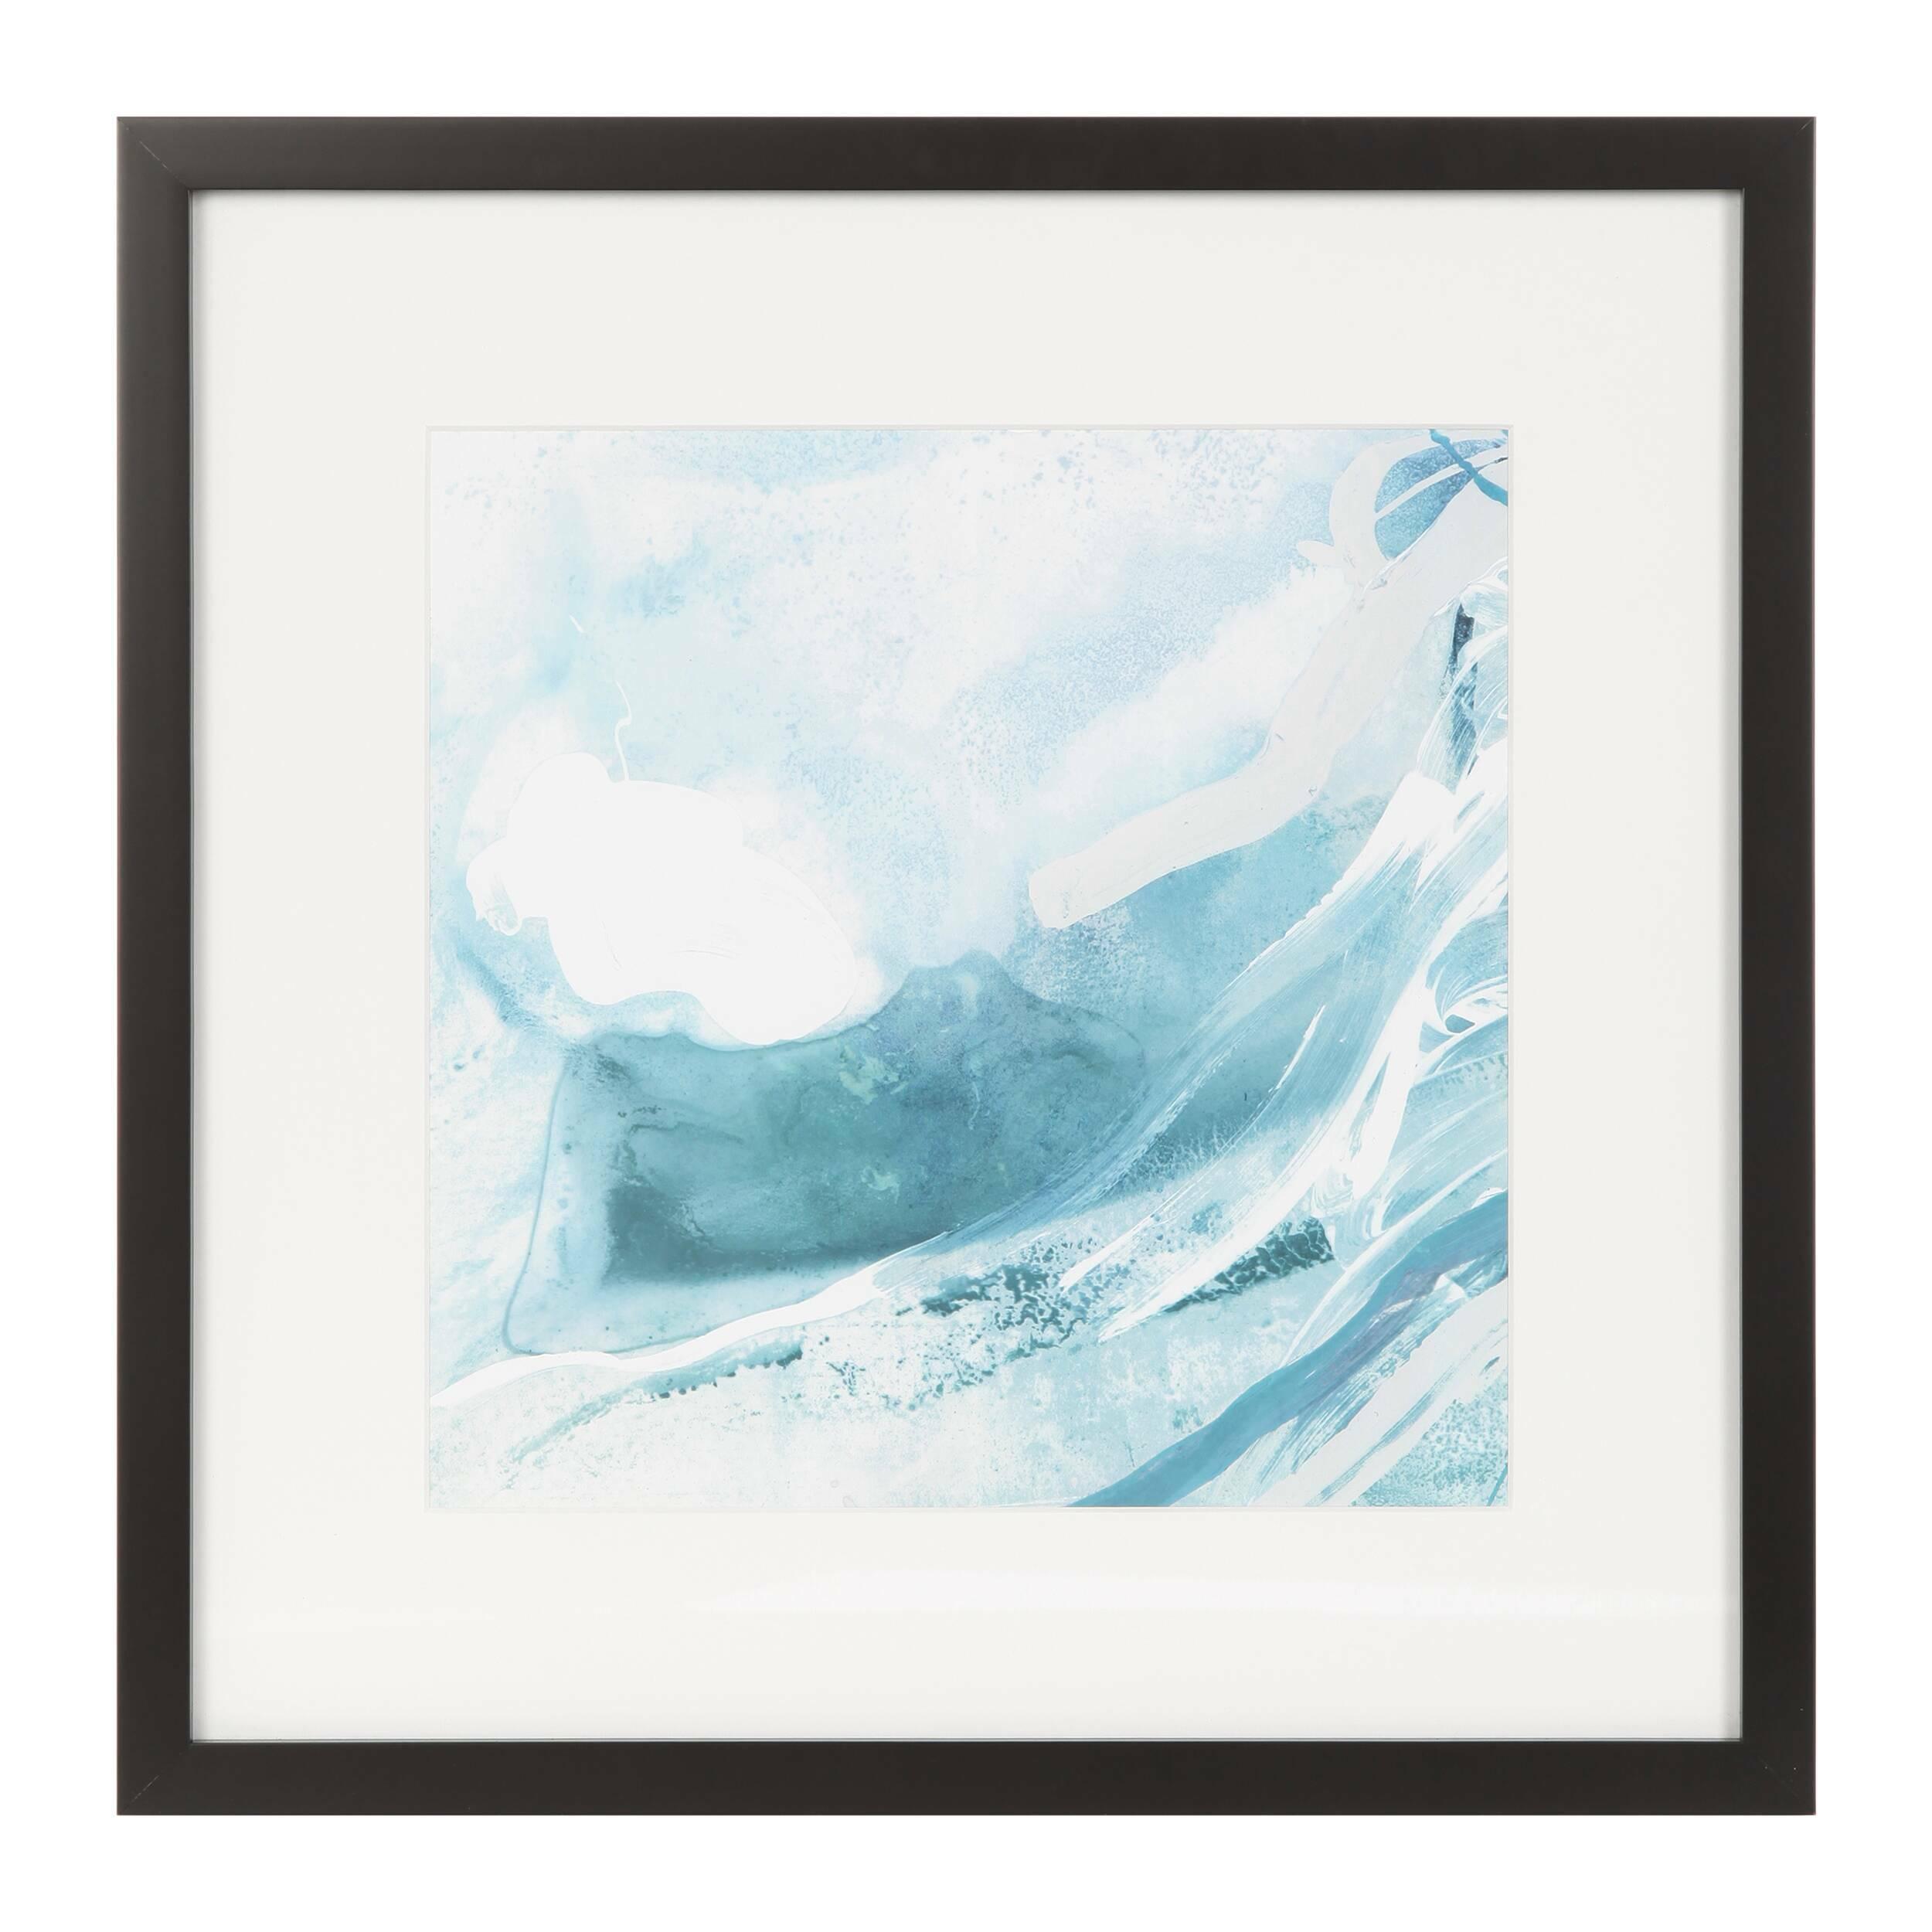 Постер Glacier 2Картины<br><br><br>stock: 10<br>Ширина: 45,8<br>Цвет: Голубой<br>Длина: 45,8